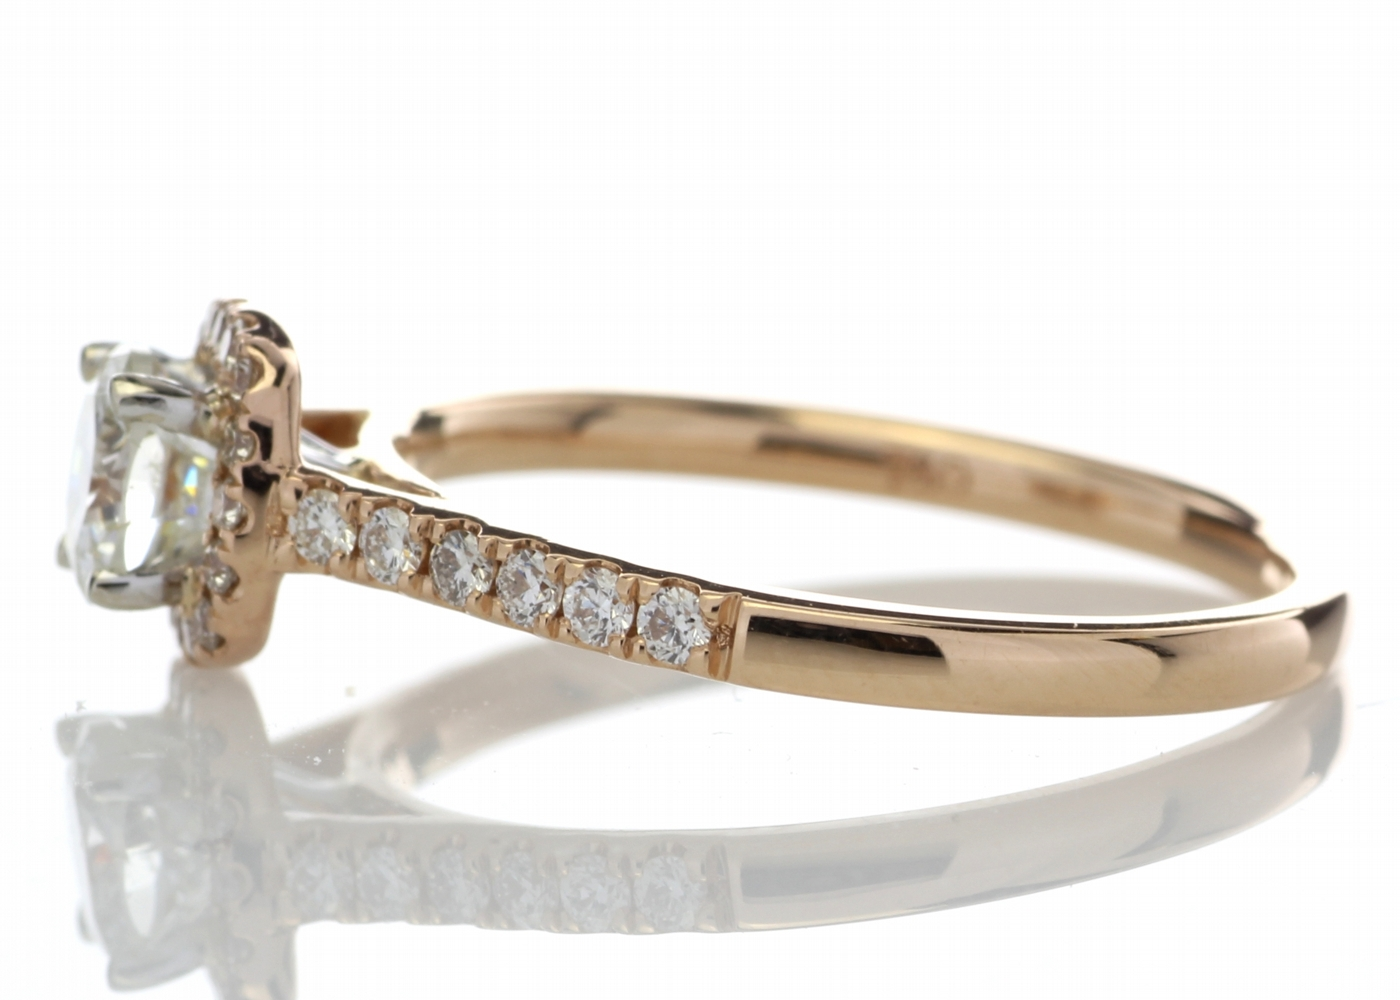 18ct Rose Gold Halo Set Ring 0.74 Carats - Image 3 of 4